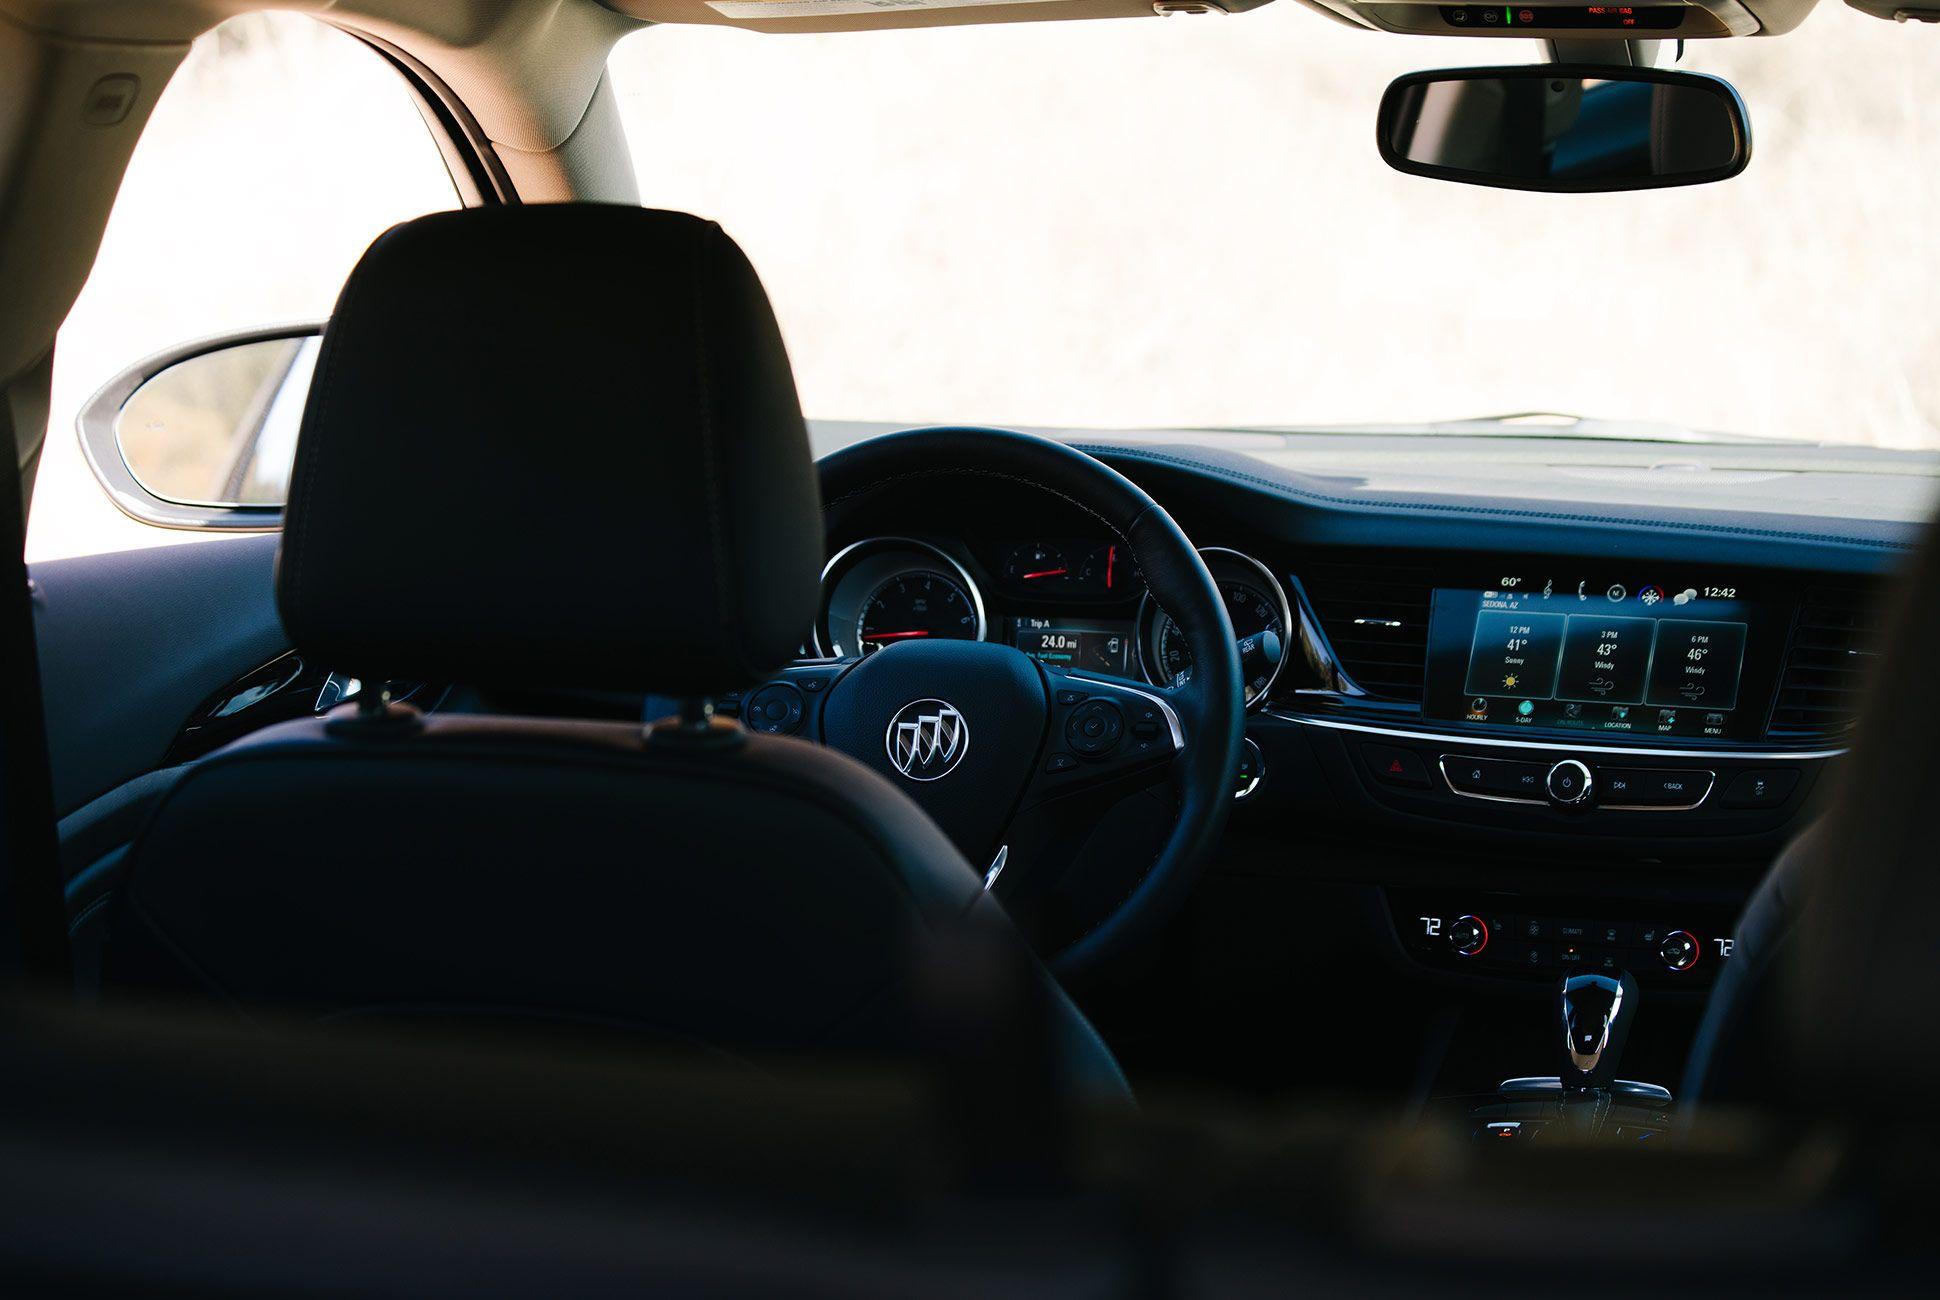 Buick-Regal-TourX-Review-gear-patrol-7